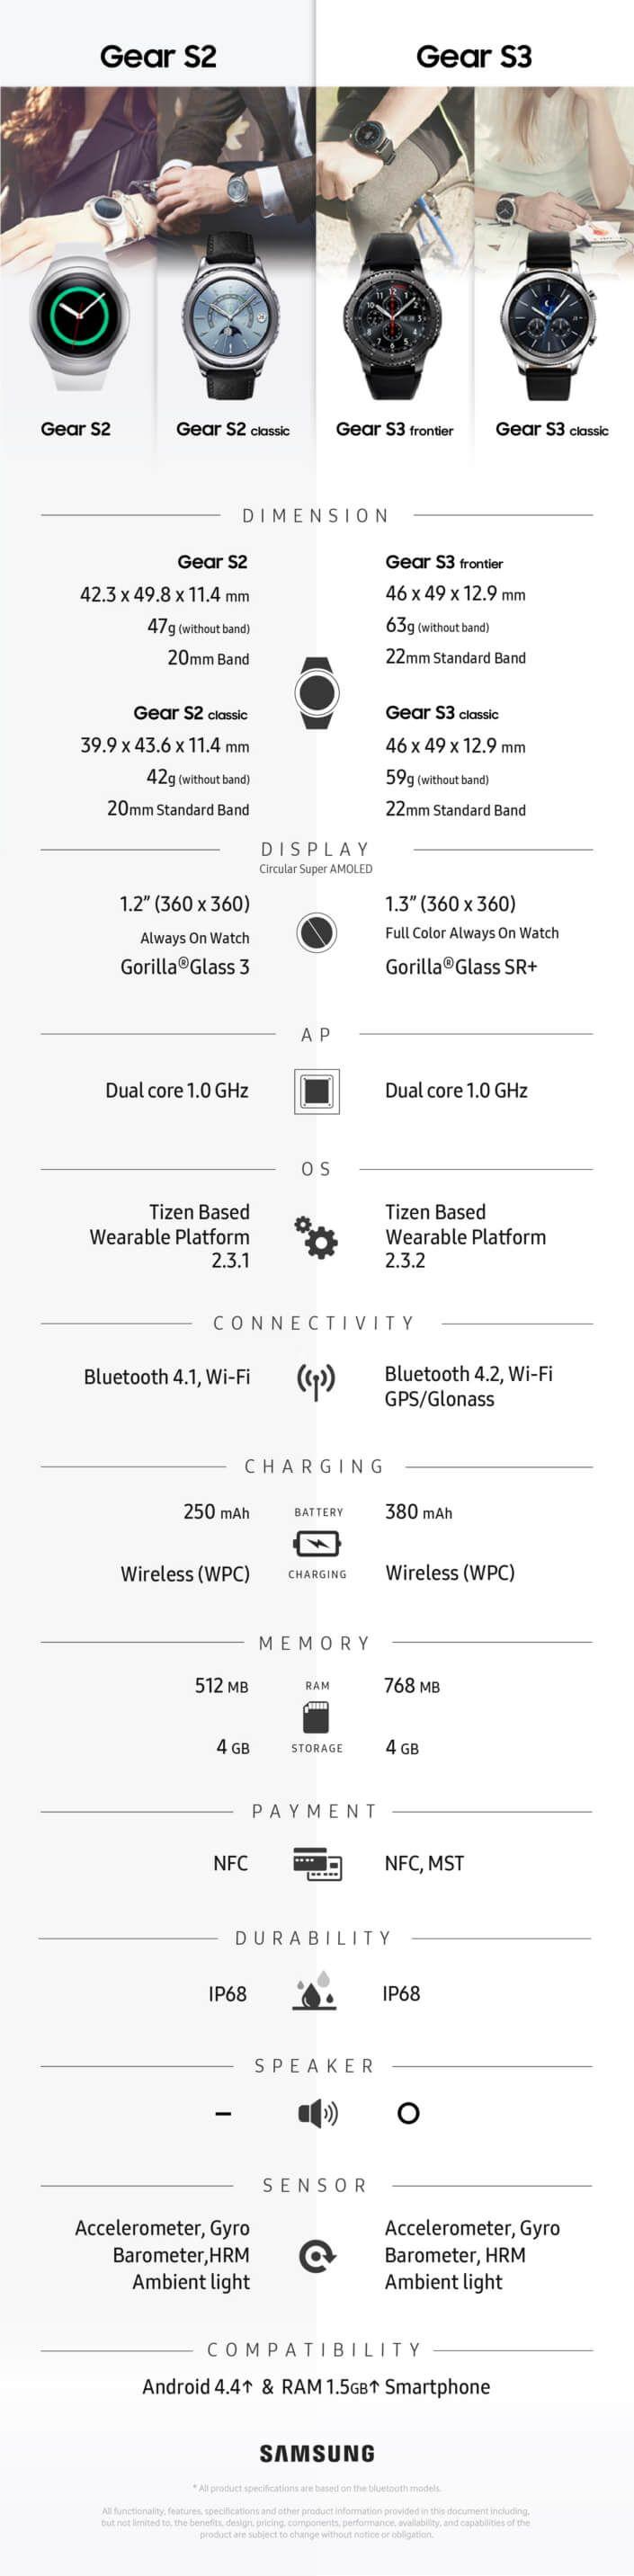 Samsung Gear S3 vs Gear S2 Infographic